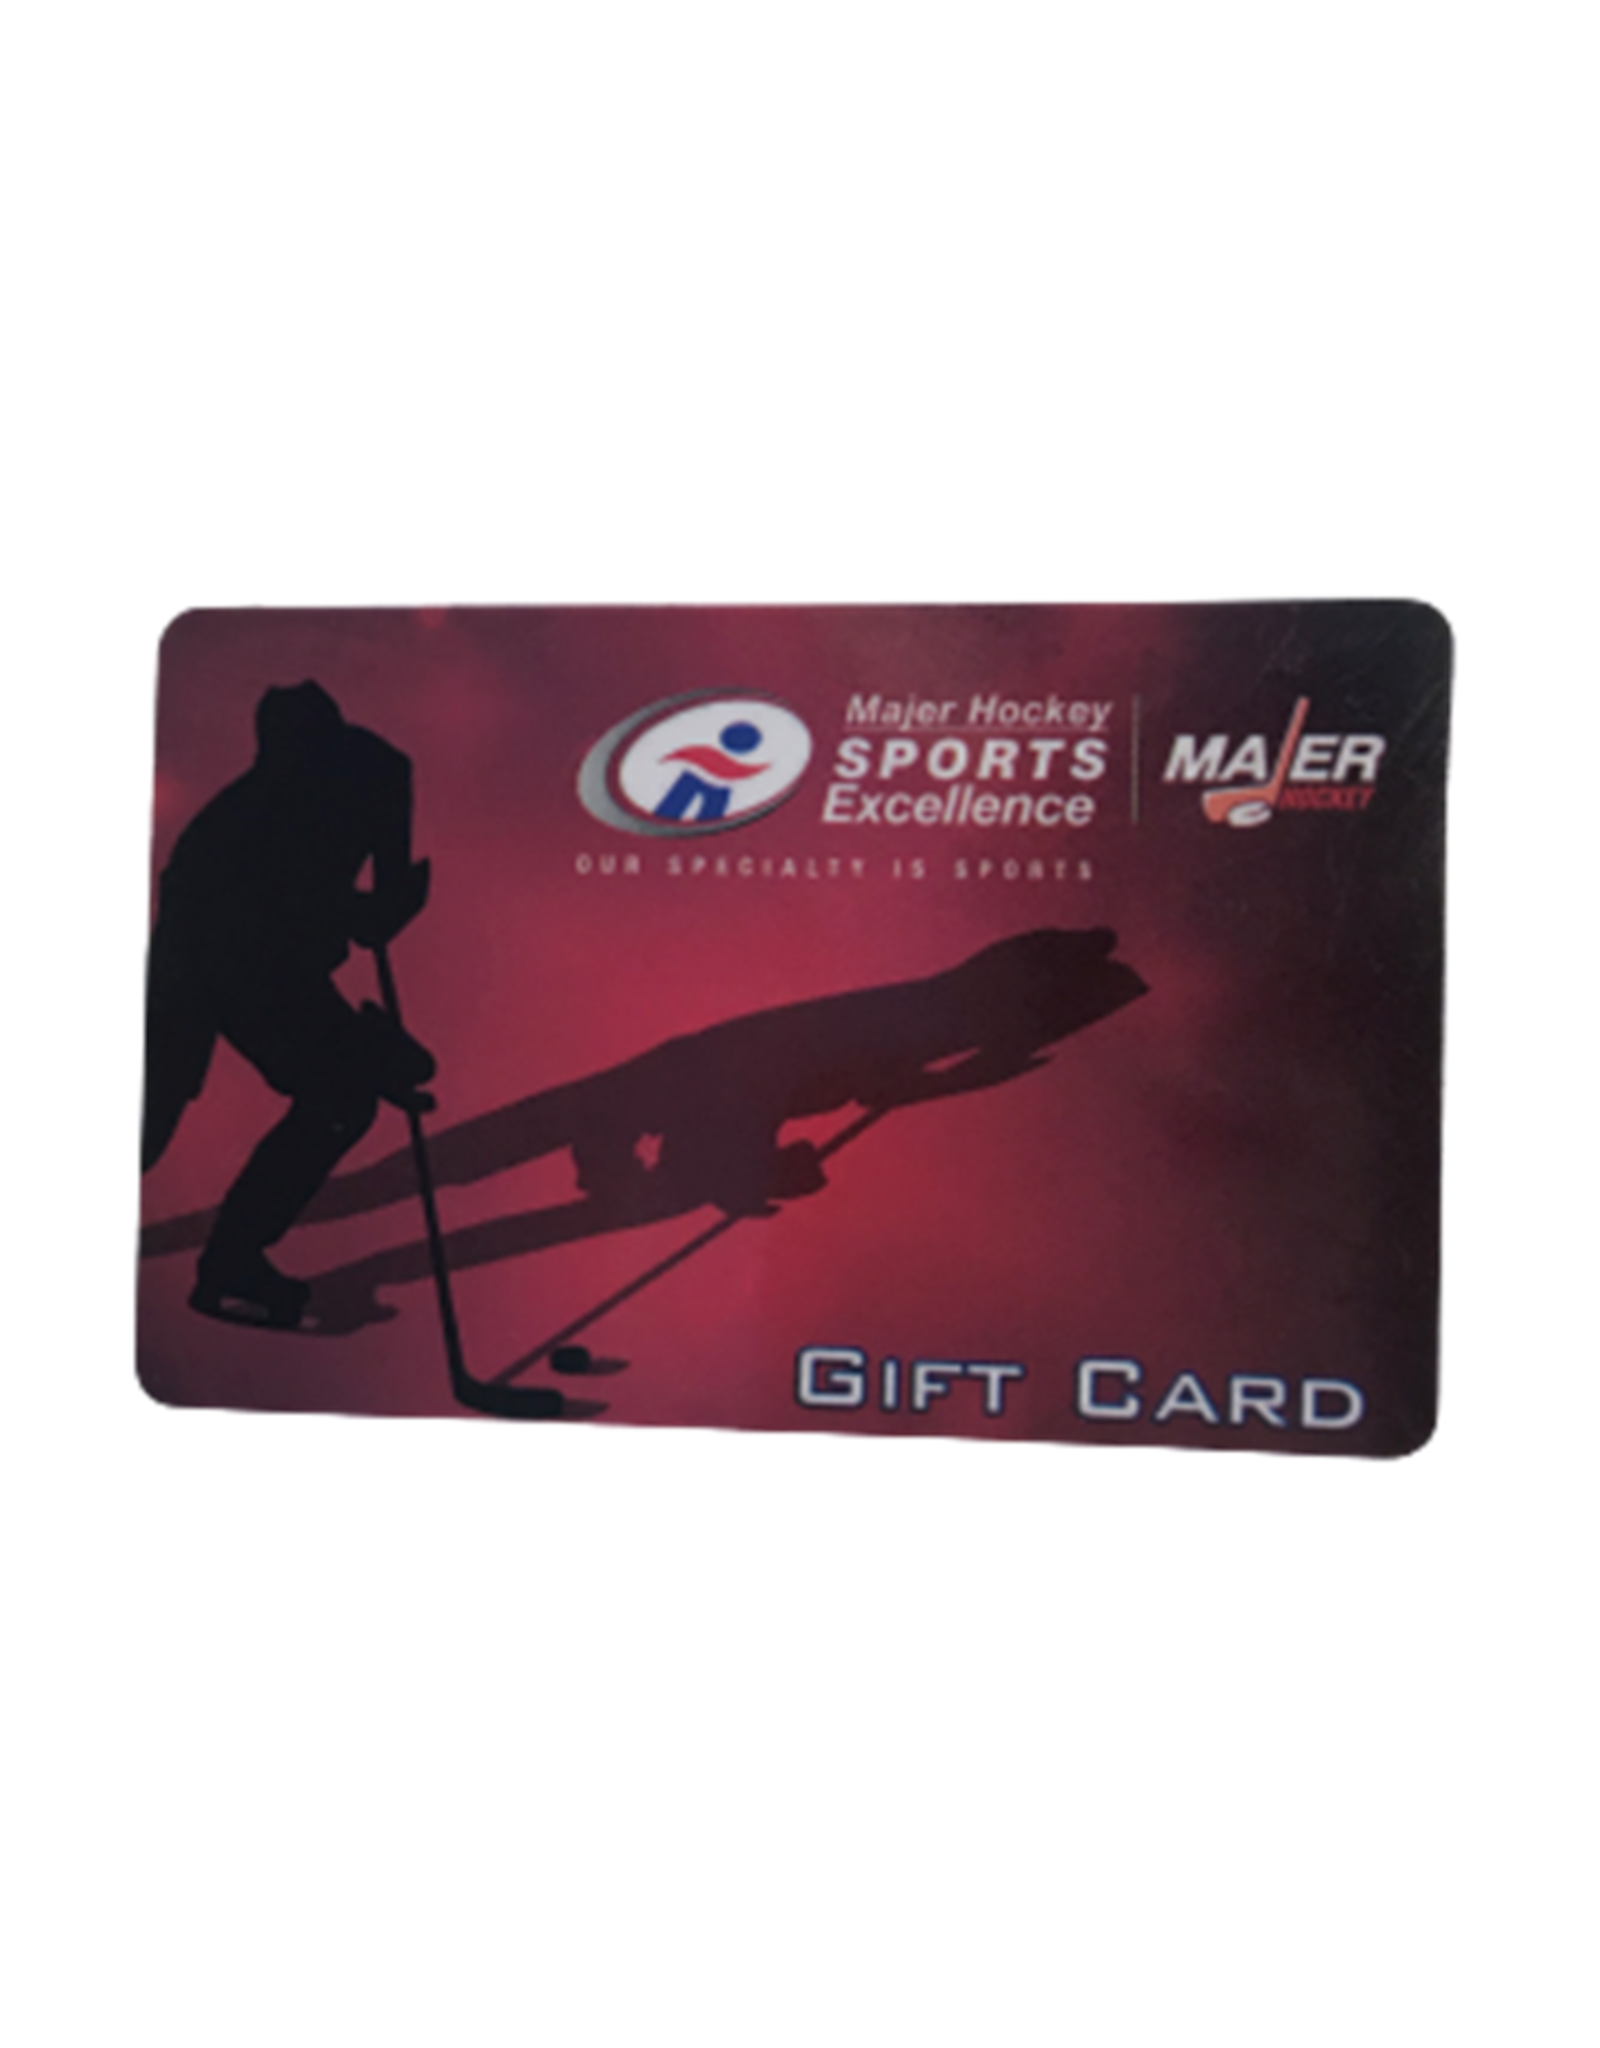 Majer Hockey Gift Card